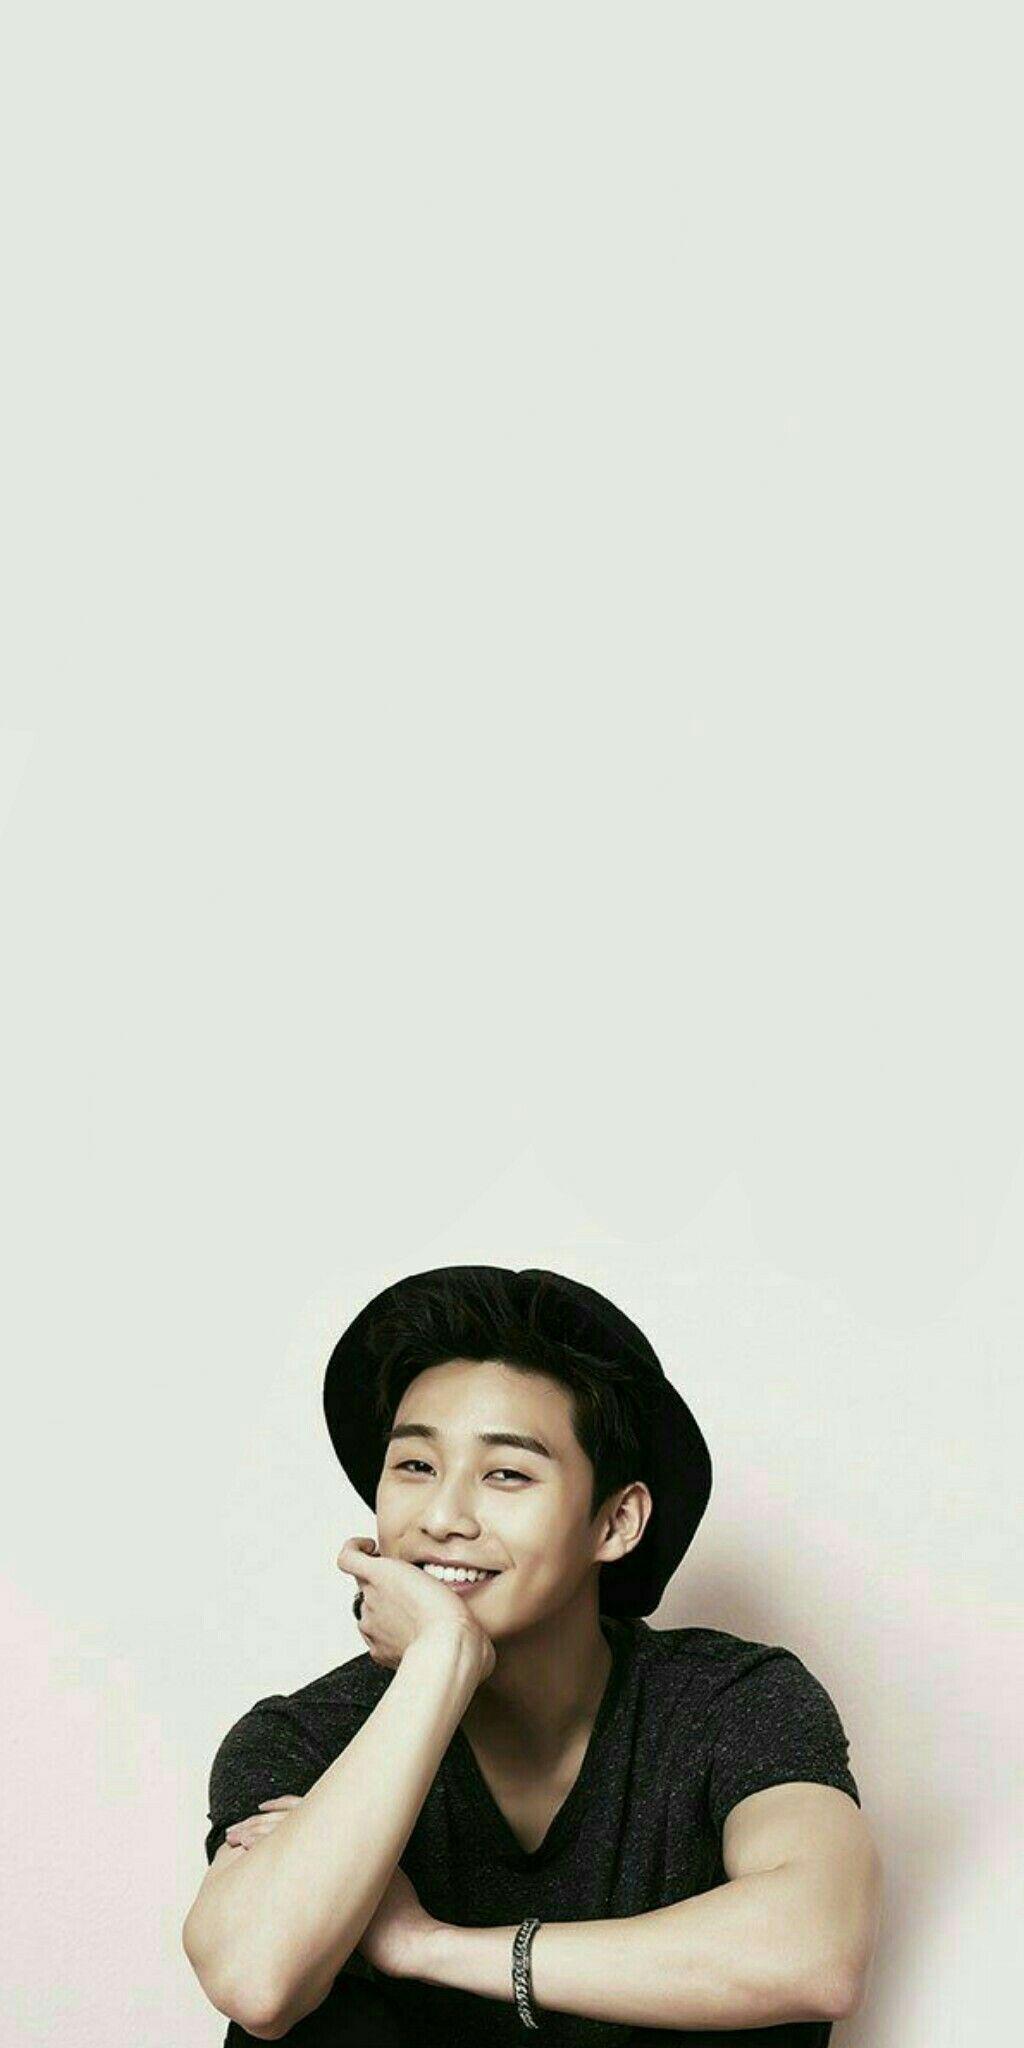 Park Seo Joon wallpaper PARK SEO JOOOOON Seo joon Park seo 1024x2048